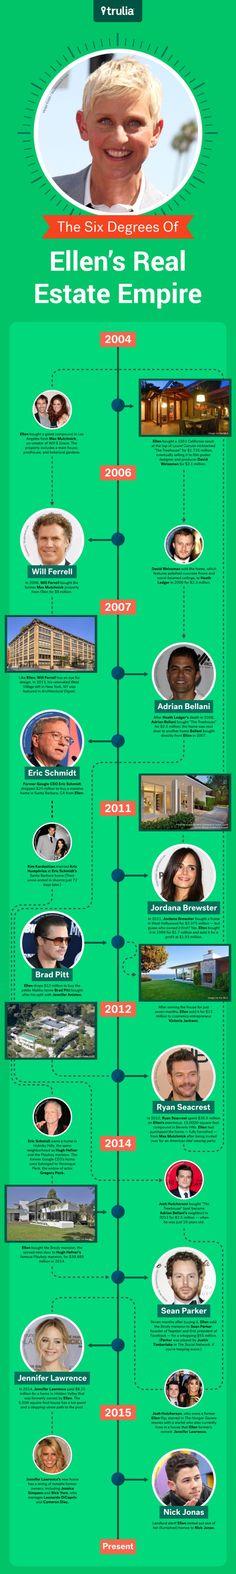 The Ellen DeGeneres Real Estate Empire